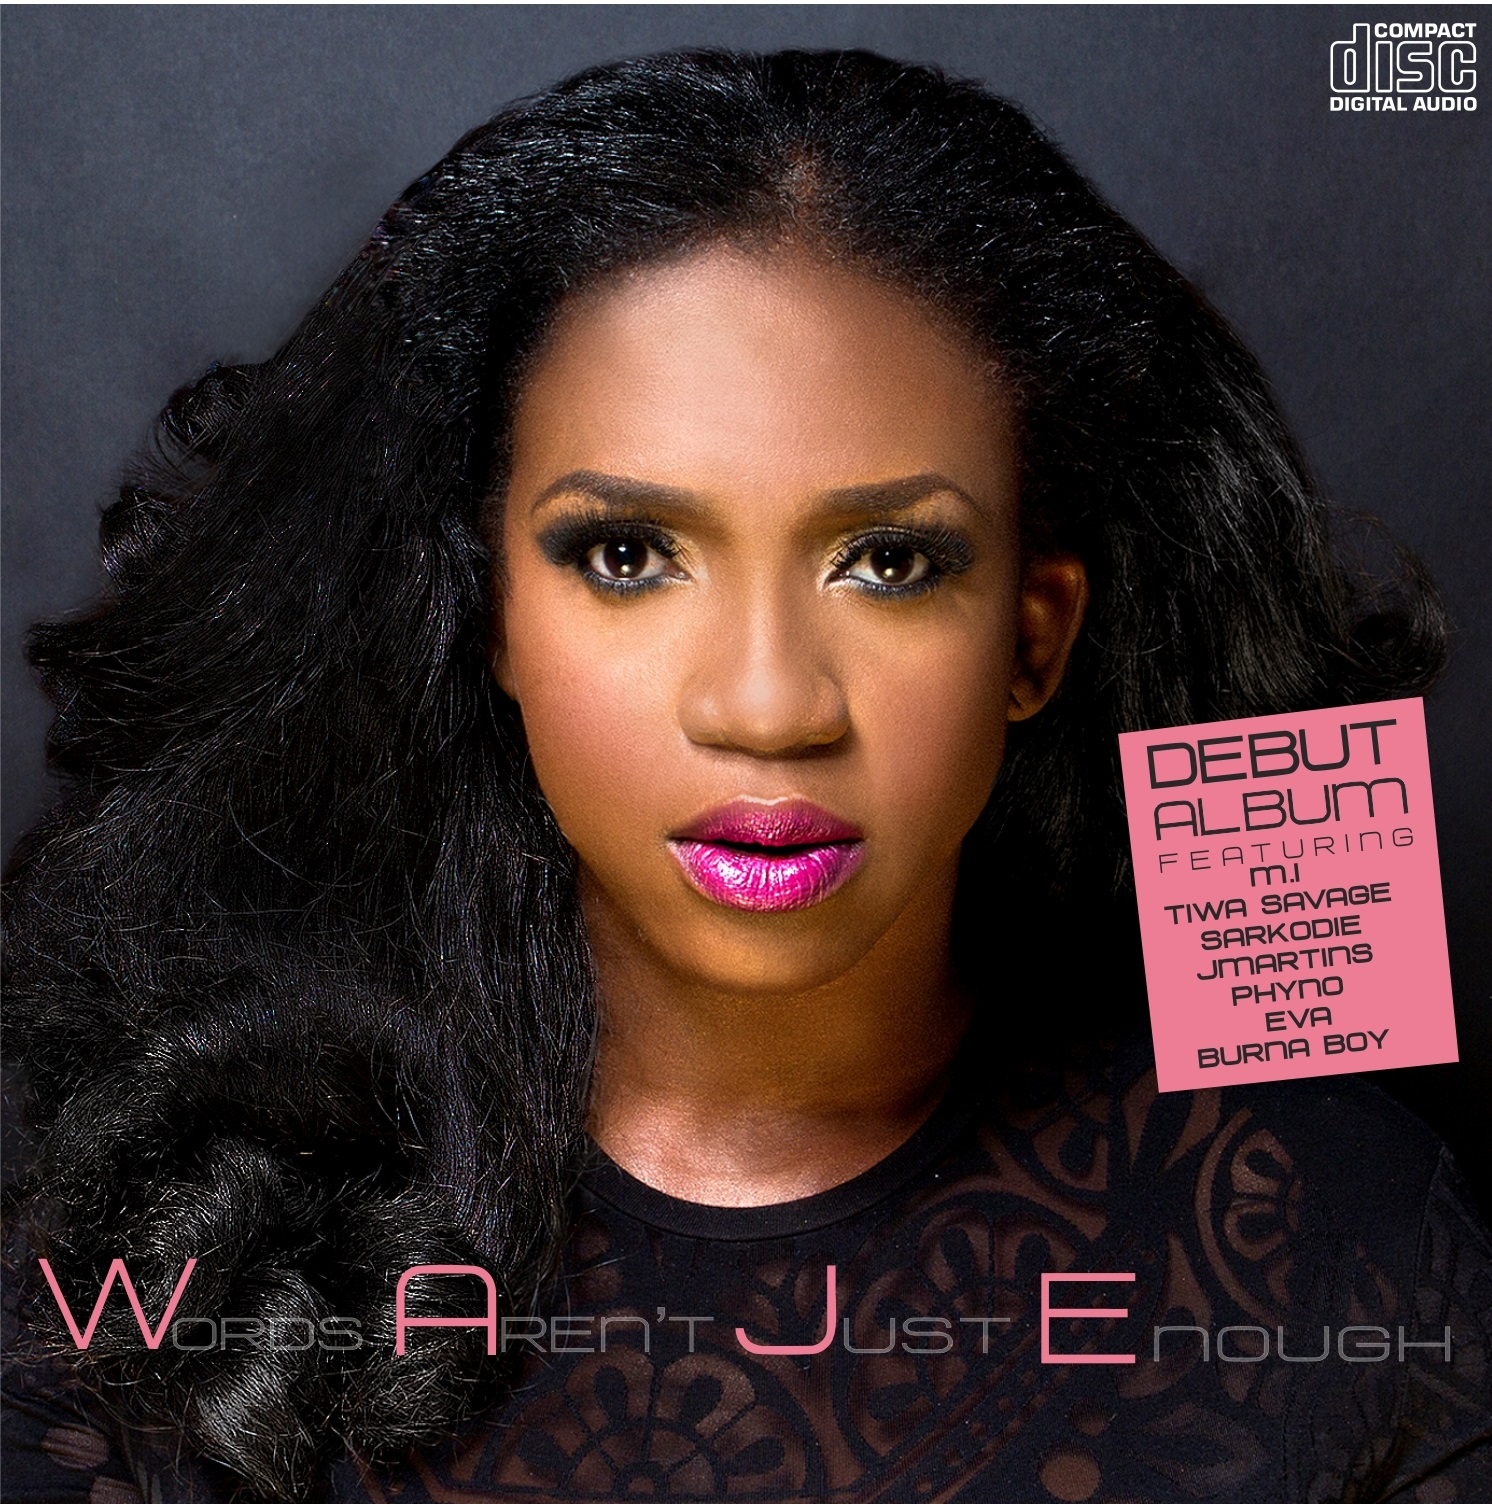 WAJE Albumart front